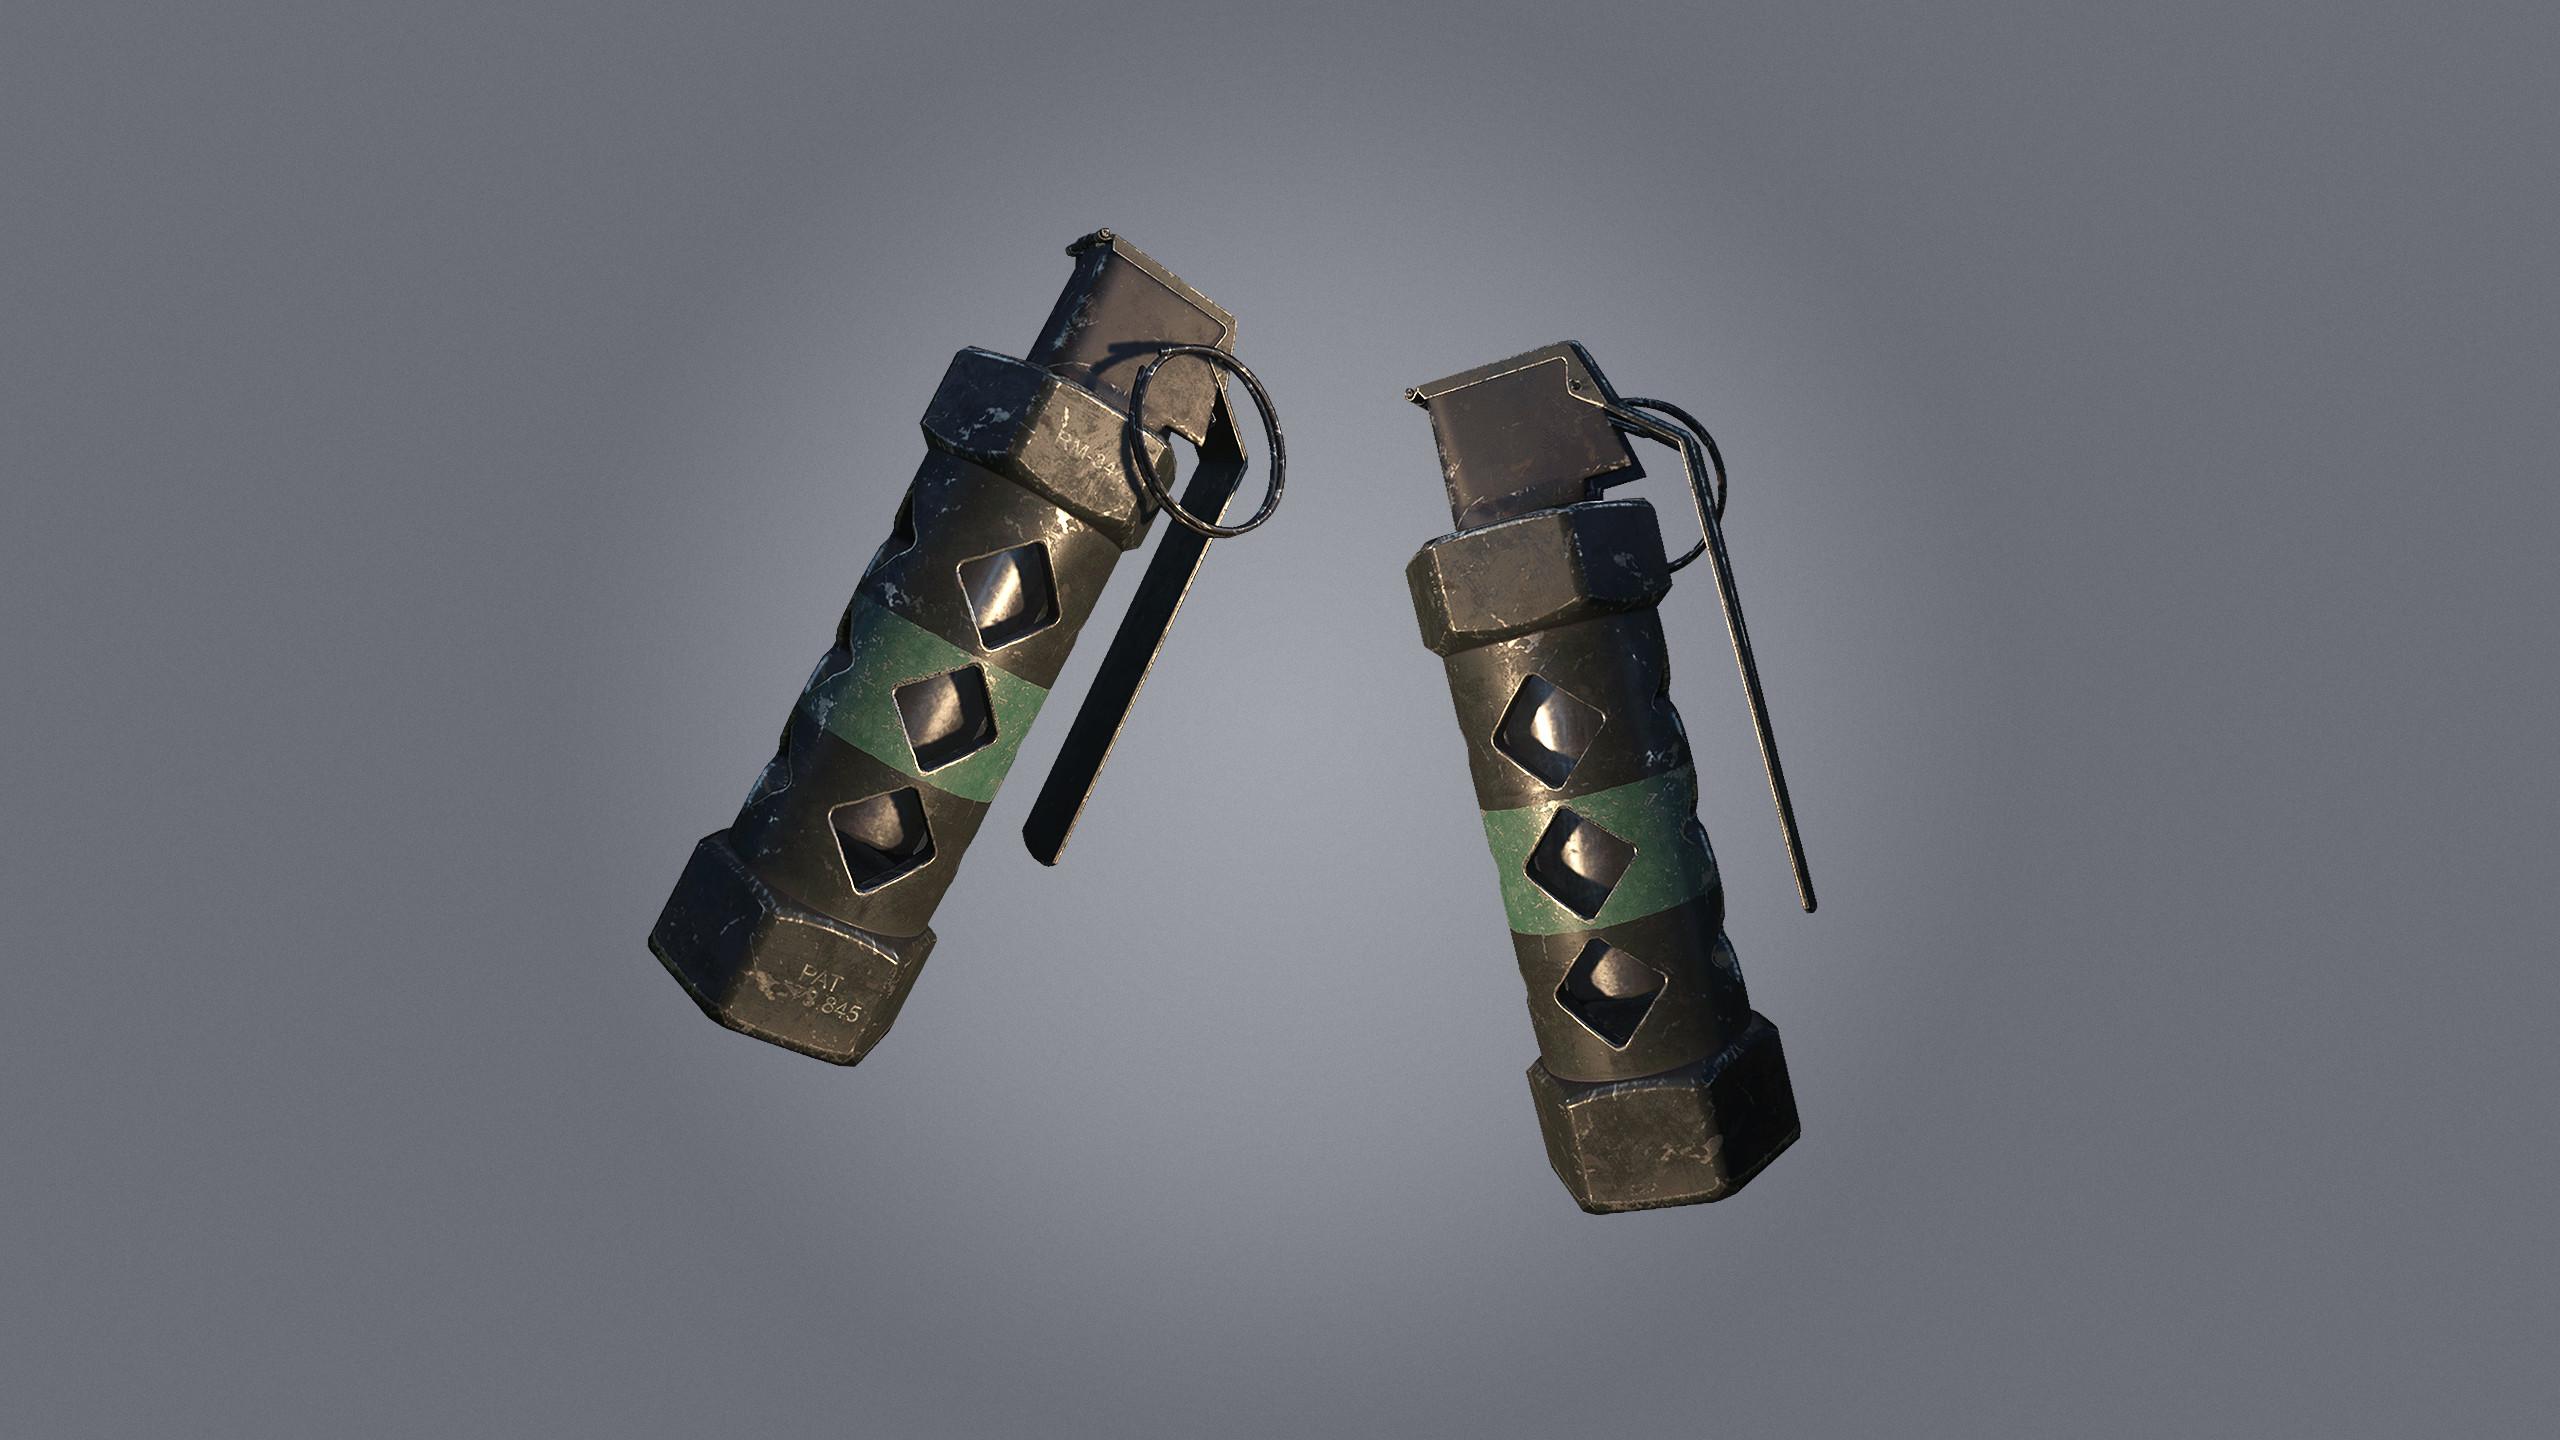 M84 Flashbang Grenade